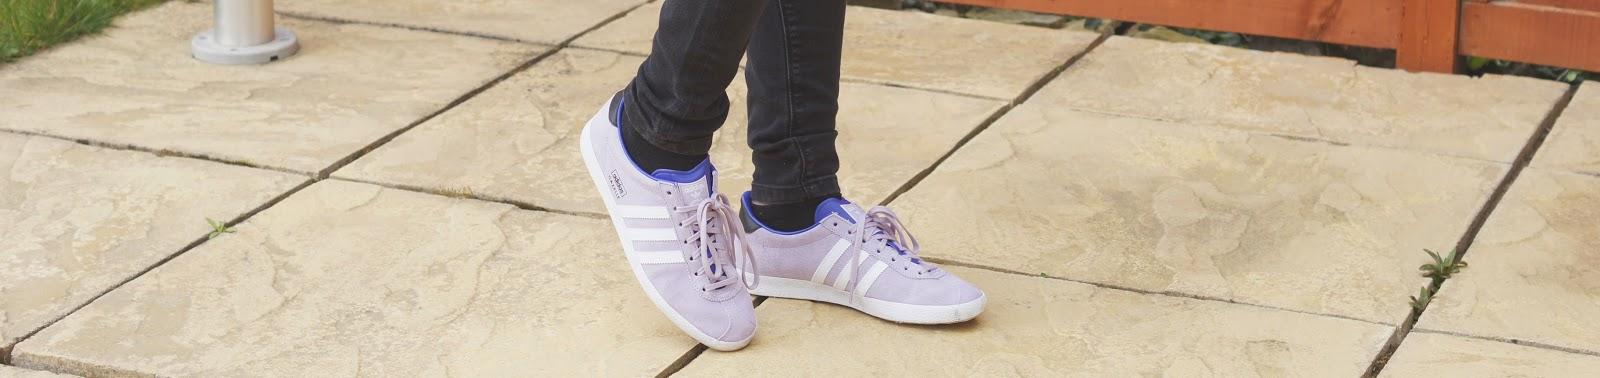 lilac gazelle adidas trainers